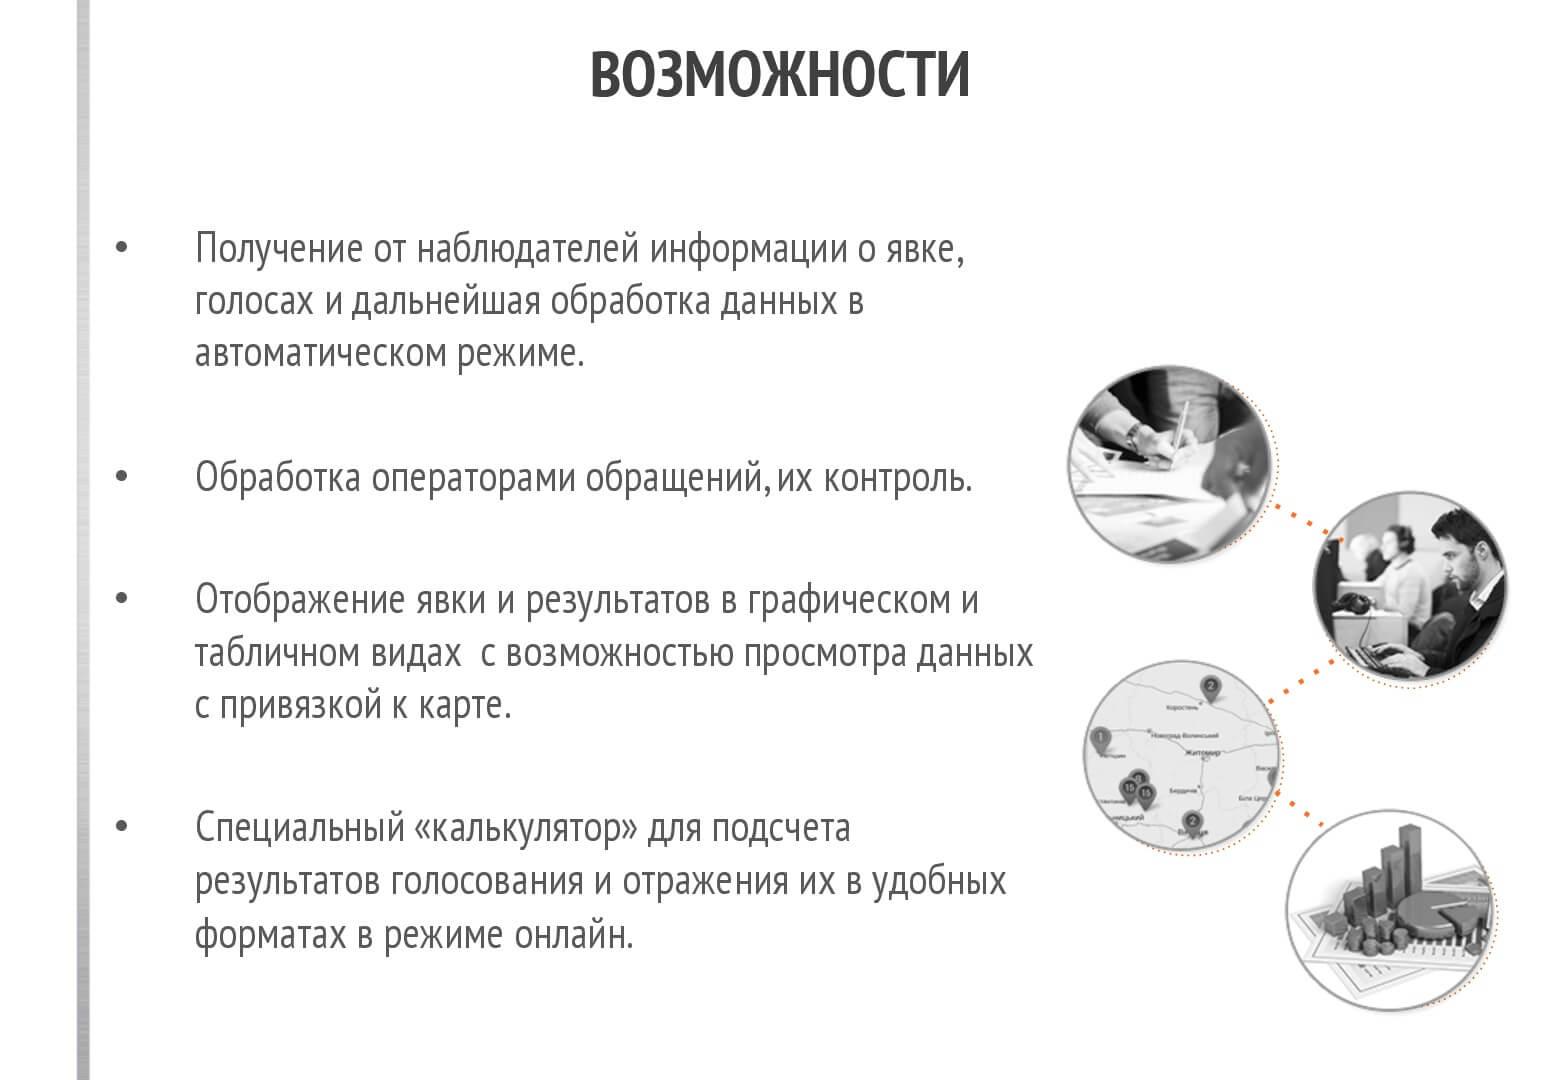 Elect.pro-BG-UA-027